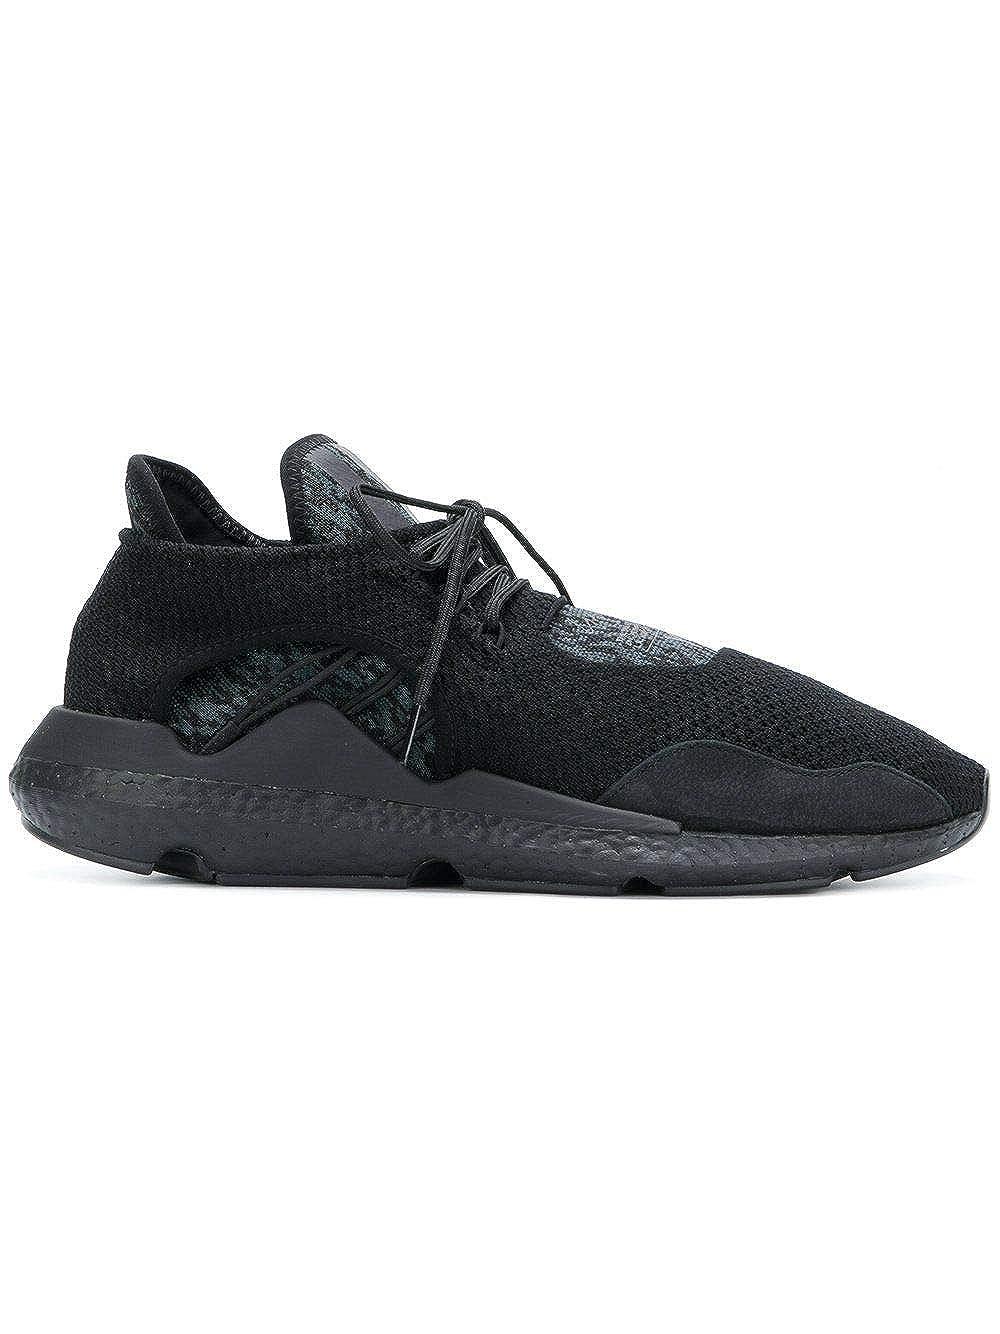 wholesale dealer 8061b 40f6c Amazon.com   Adidas Y-3 Yohji Yamamoto Men s AC7197 Black Polyamide  Sneakers   Fashion Sneakers